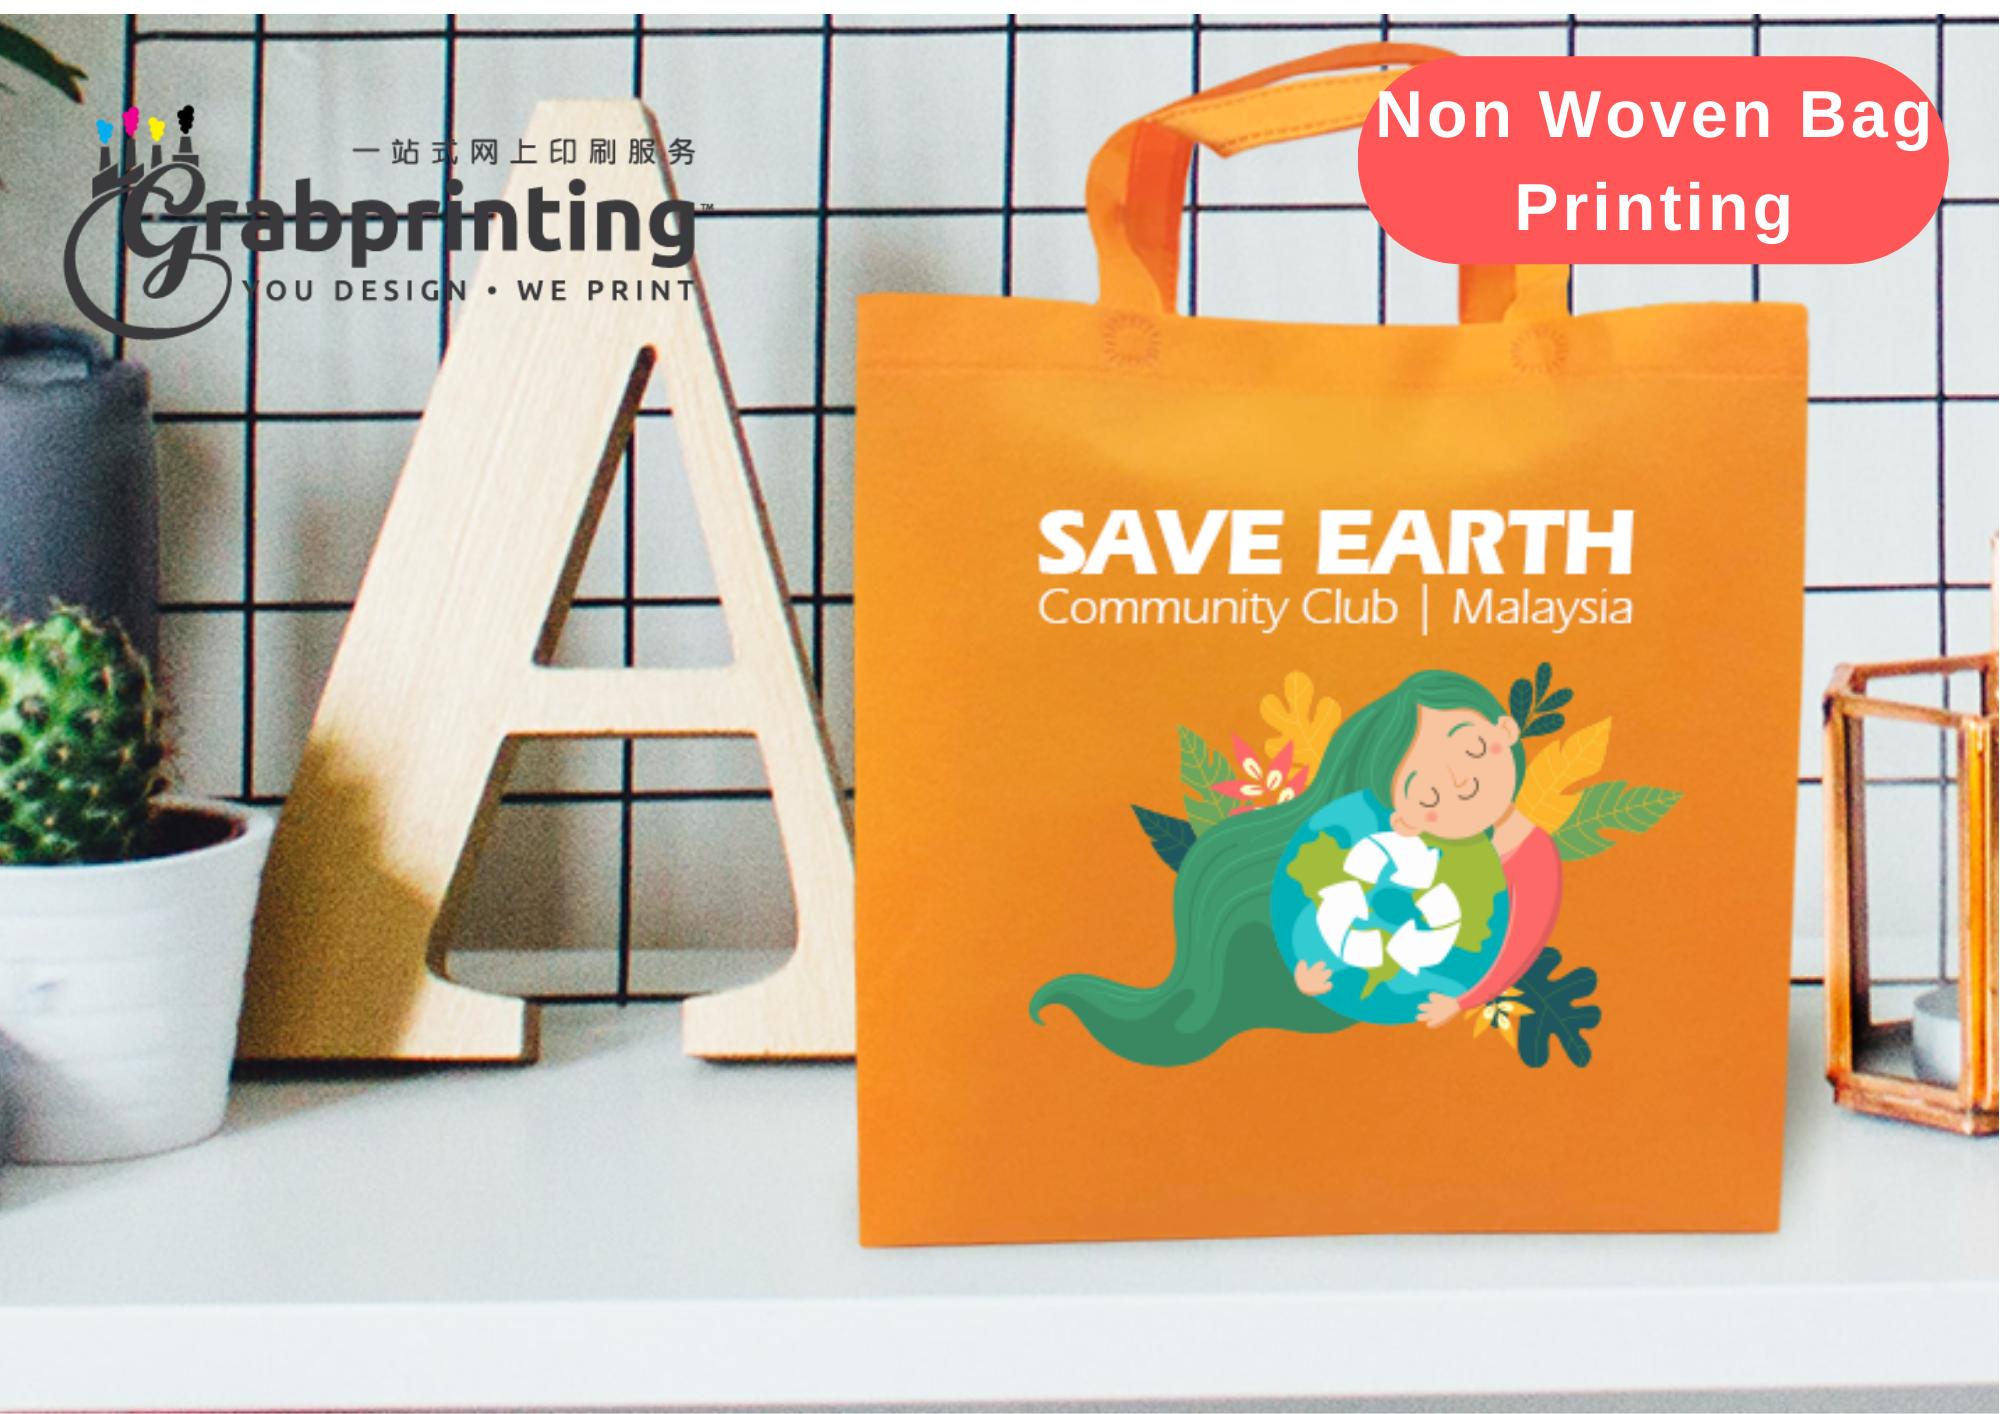 Non Woven Bag Printing Non woven bag printing 3